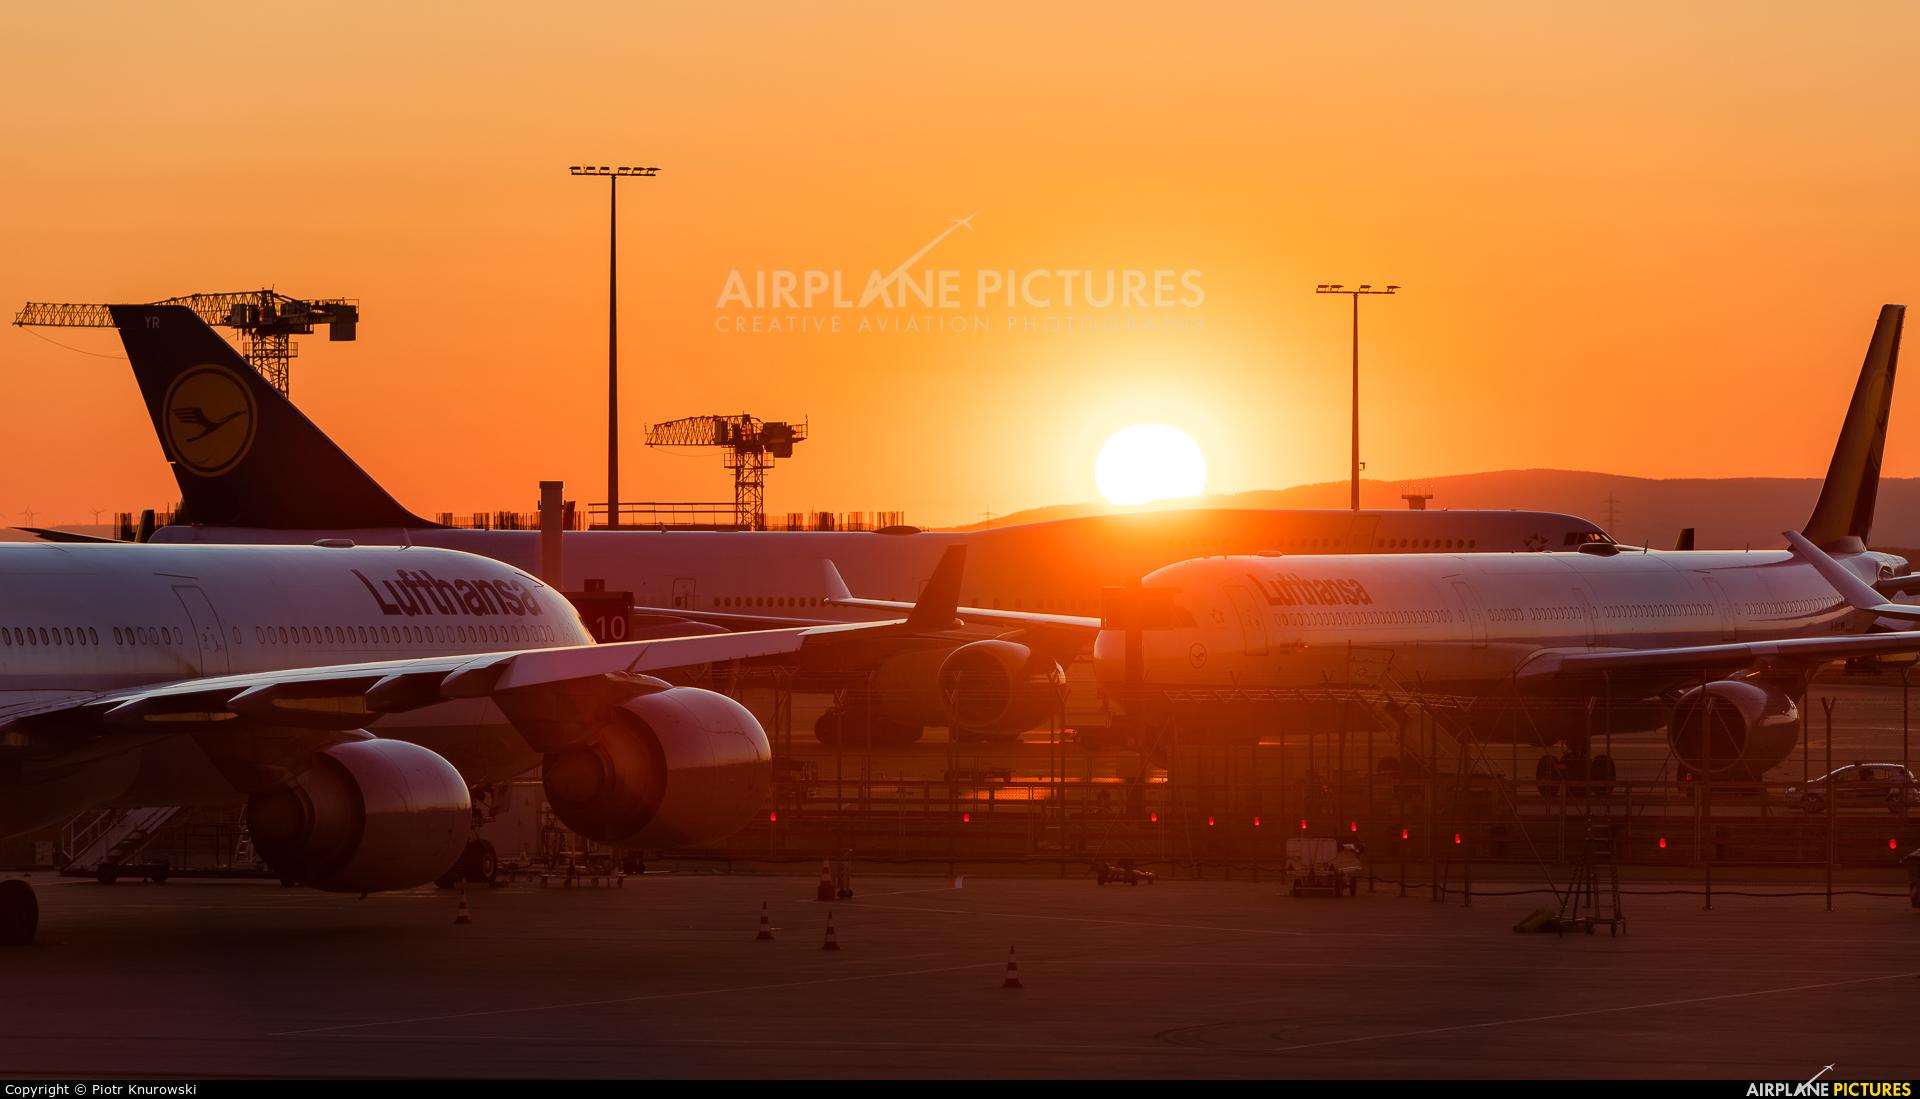 Lufthansa D-AIHP aircraft at Frankfurt